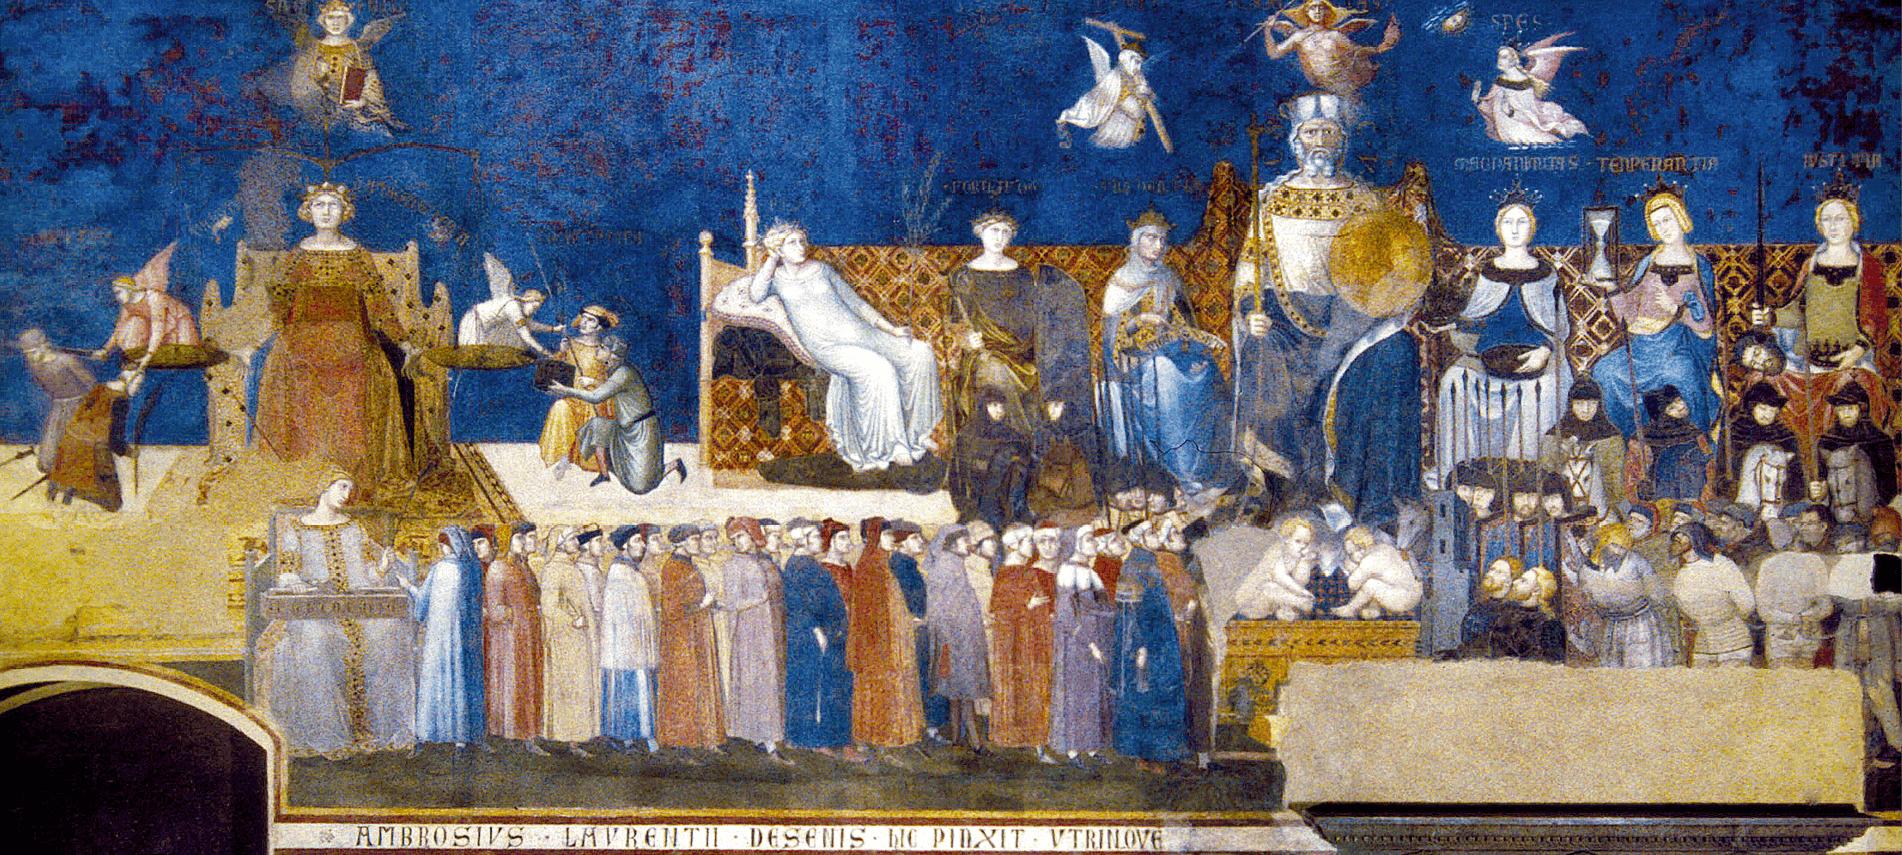 Le bon gouvernement au Moyen Âge : fresque Ambrogio Lorenzetti